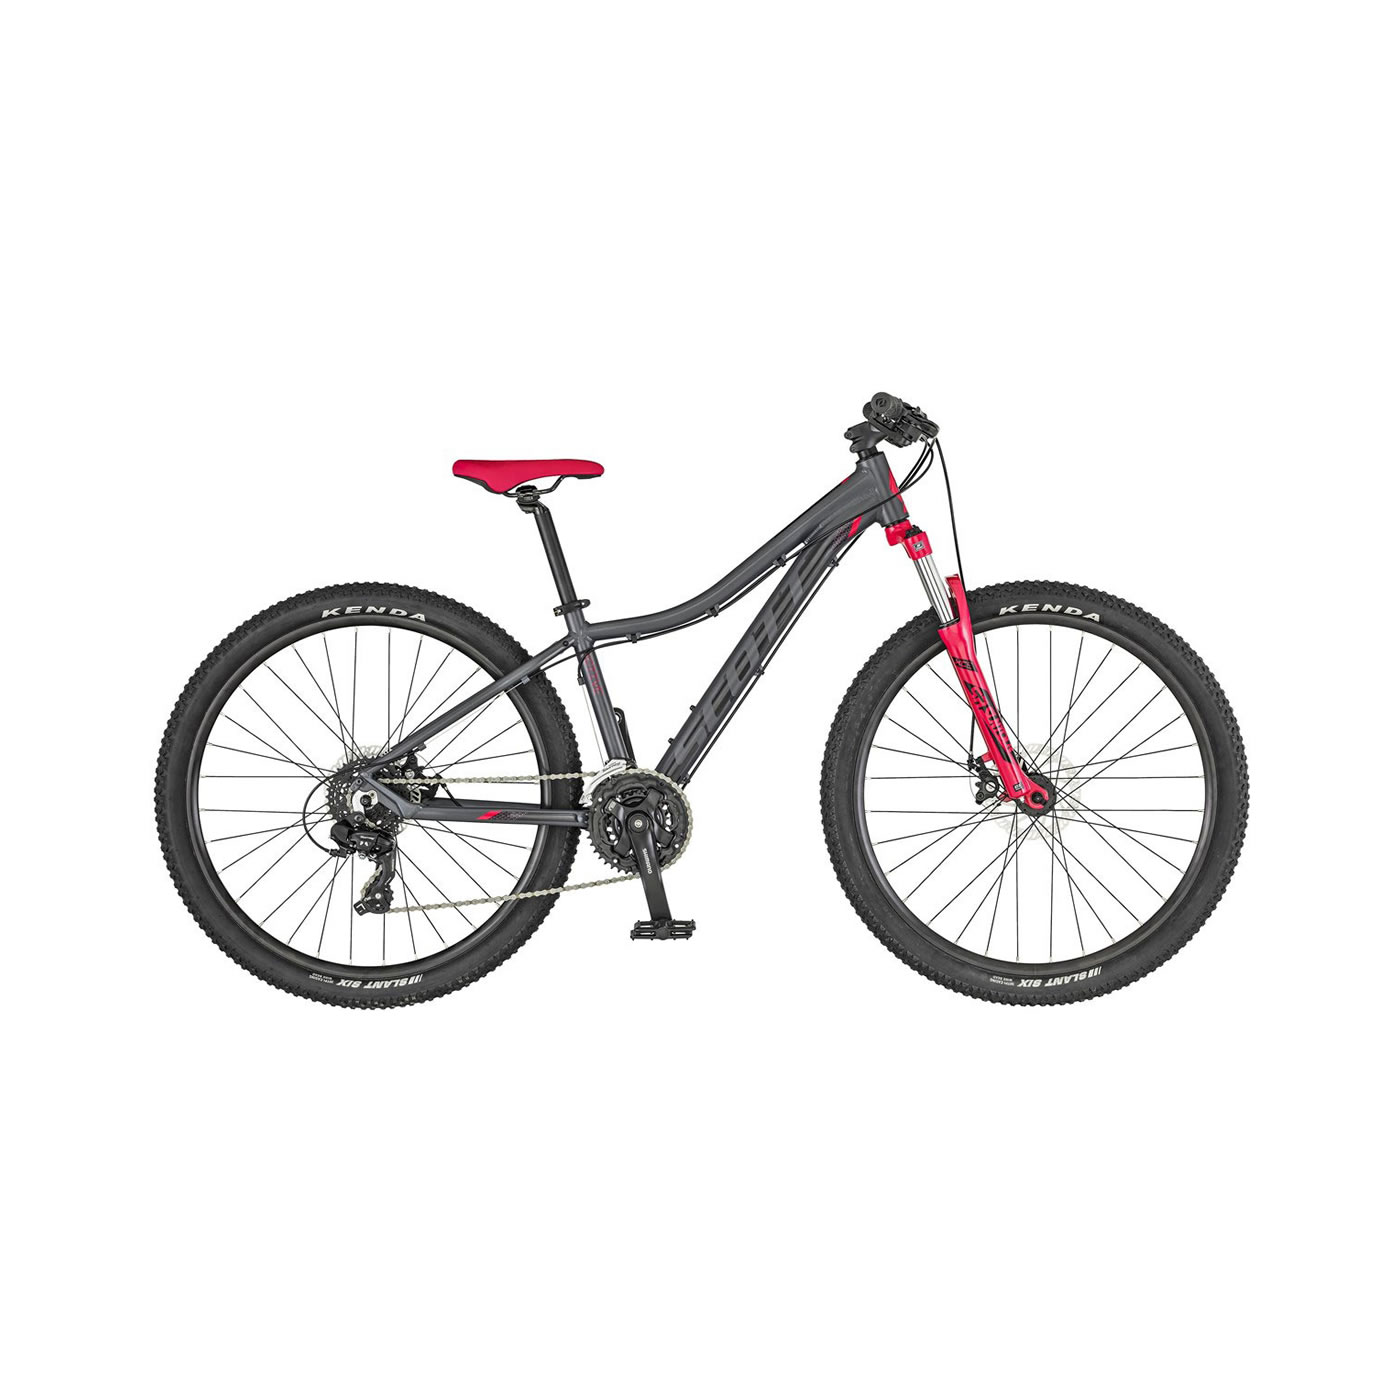 4bffdea0bdc Scott Contessa 740 27.5 mountain bike 2019 | Bikestyle